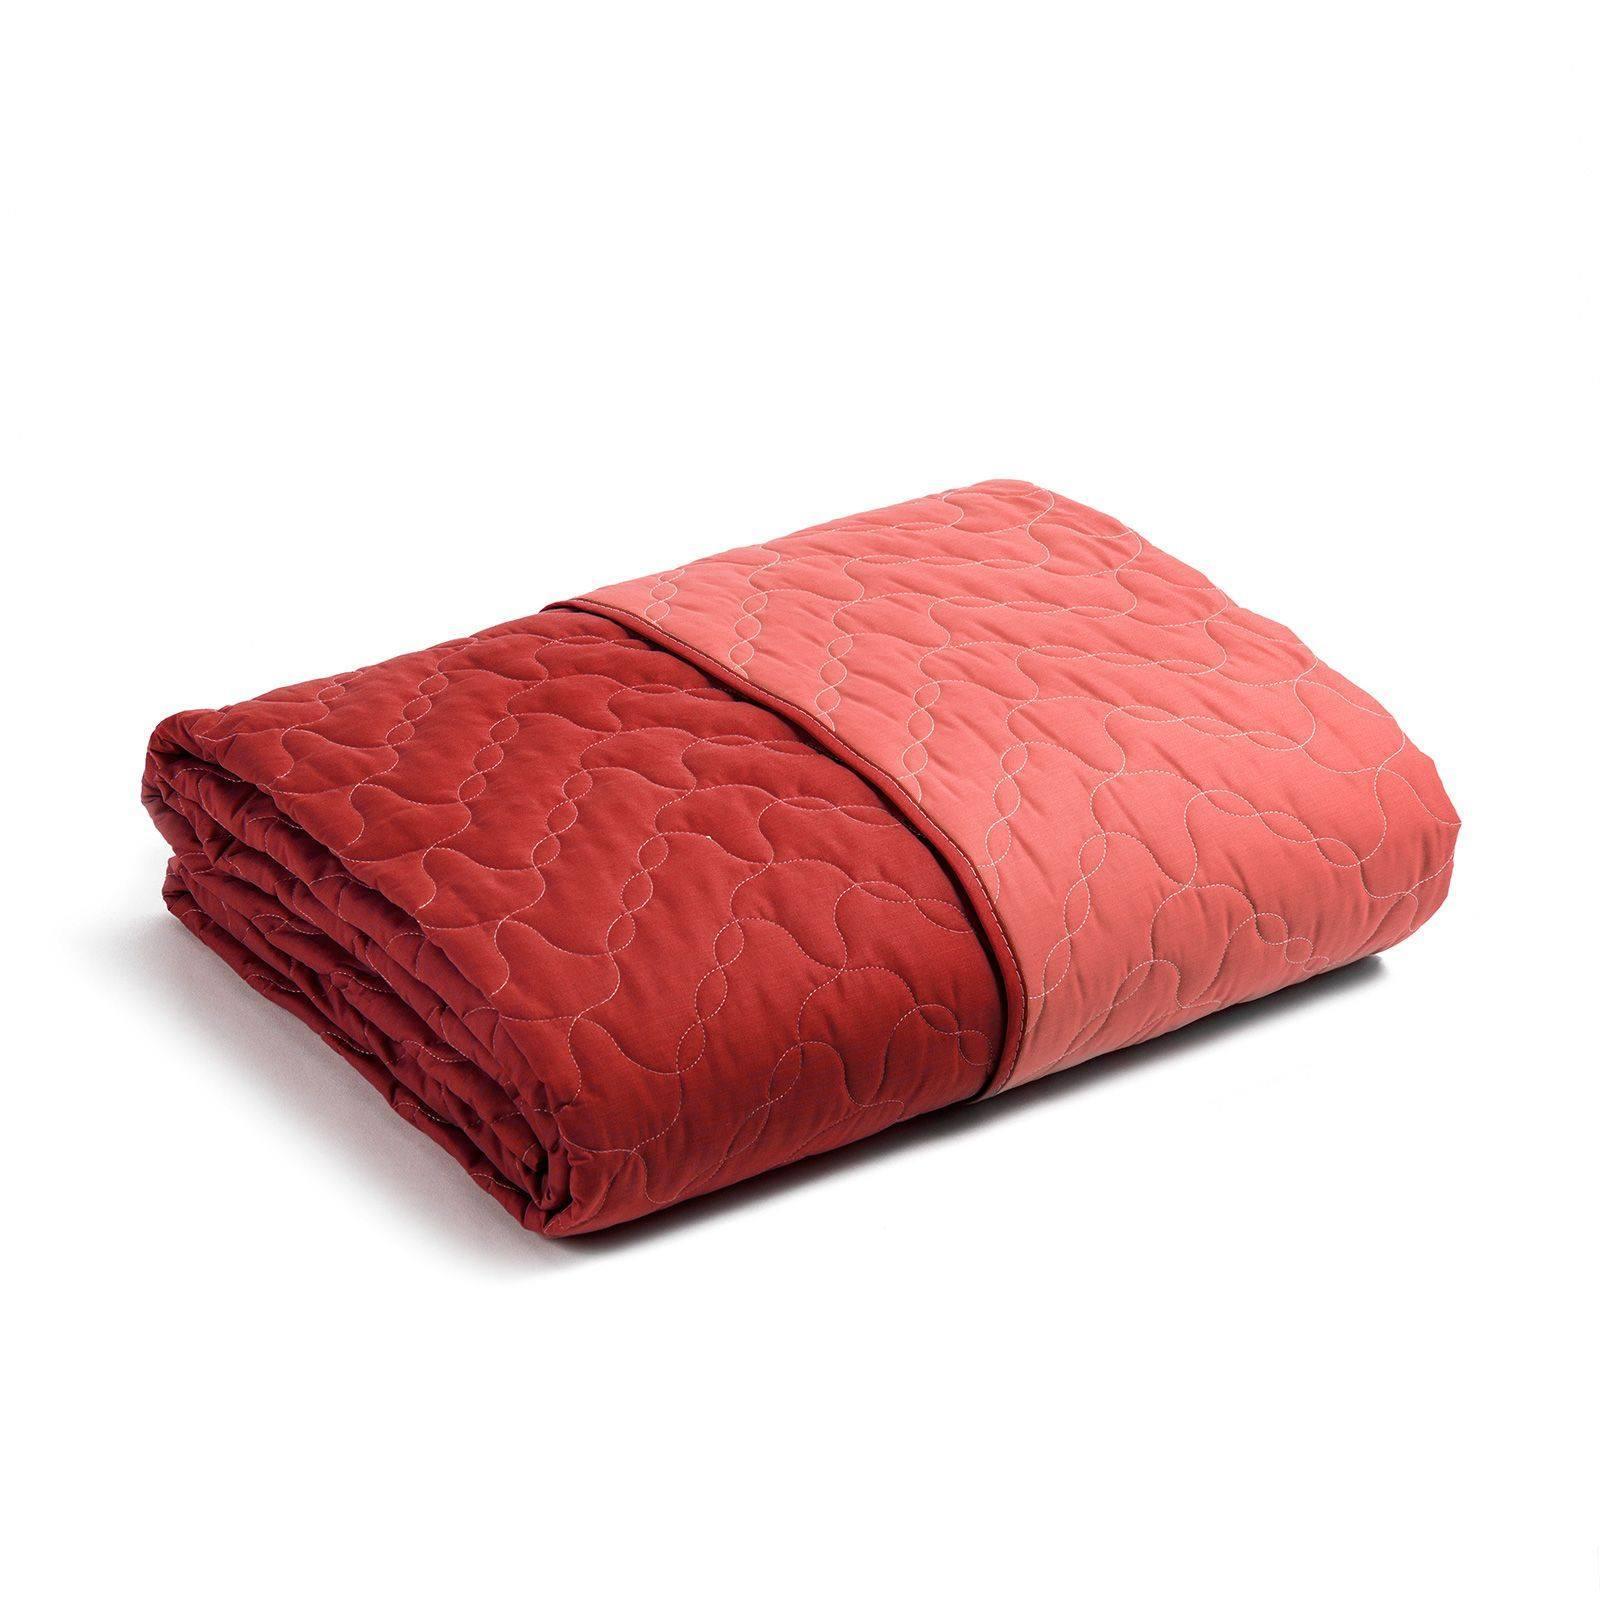 Покрывала Покрывало 220x270 Caleffi Mix Double красное pokryvalo-caleffi-mix-double-krasnoe-italiya.jpg